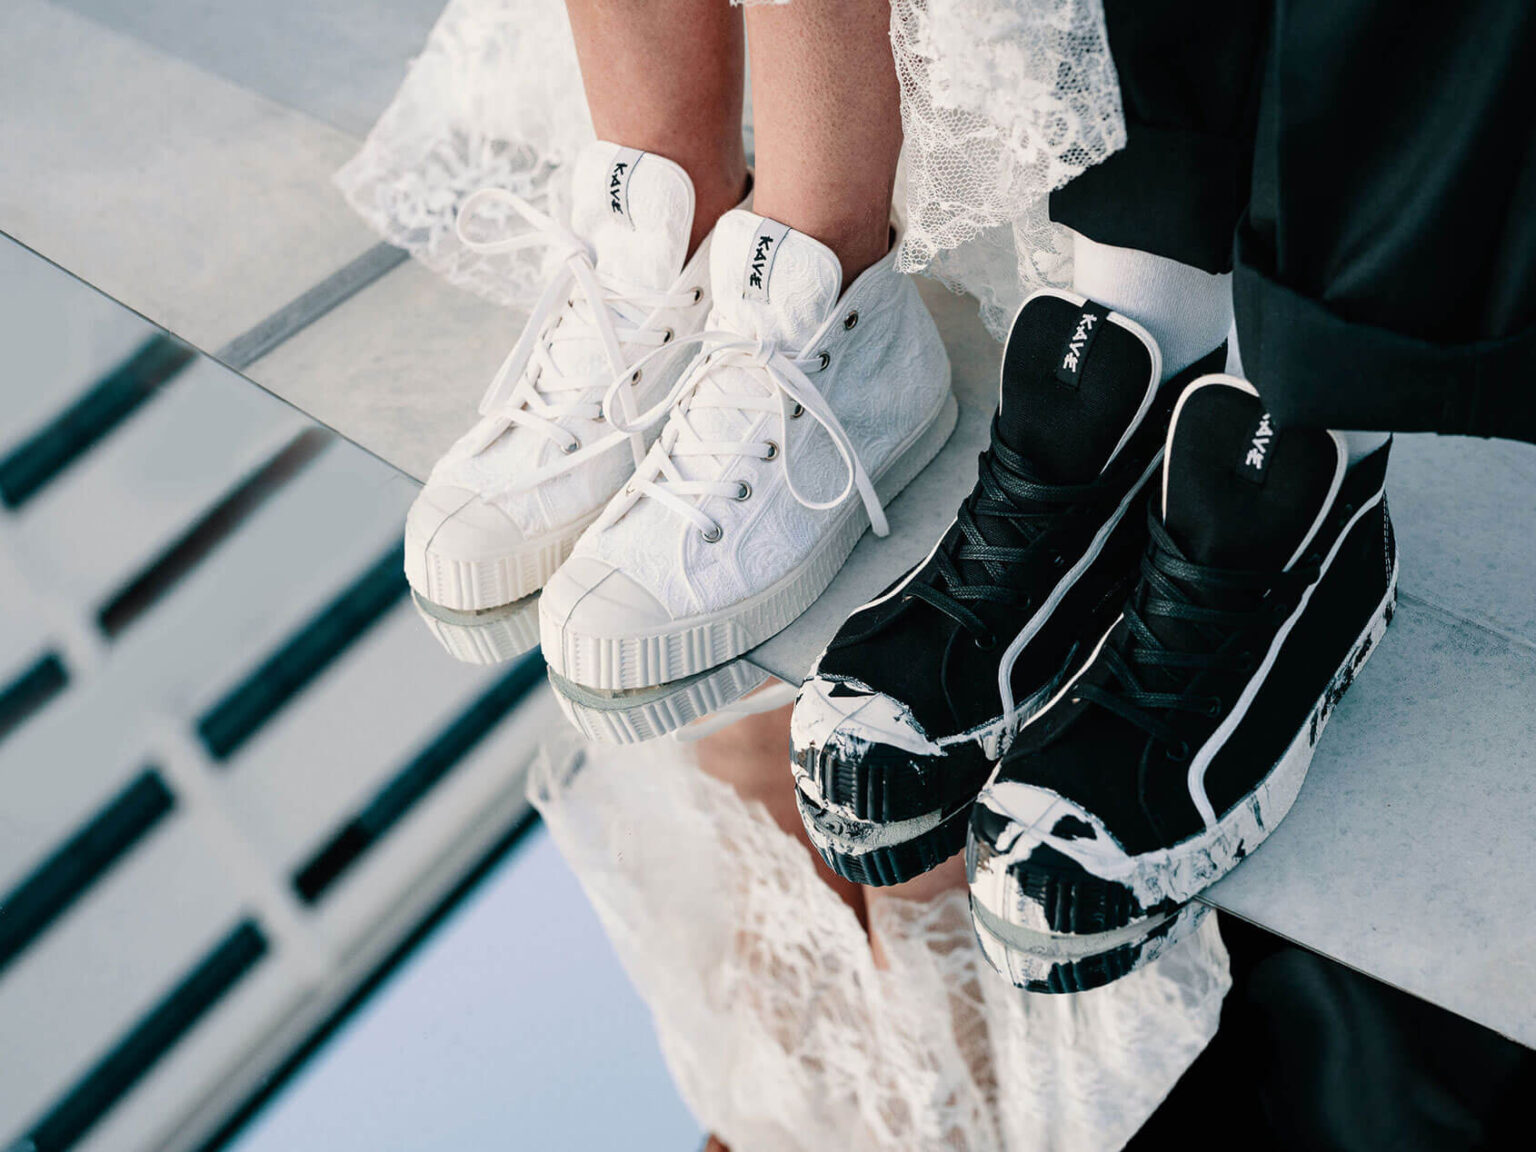 kave-footwear-svatebni-tenisky-1536x1152